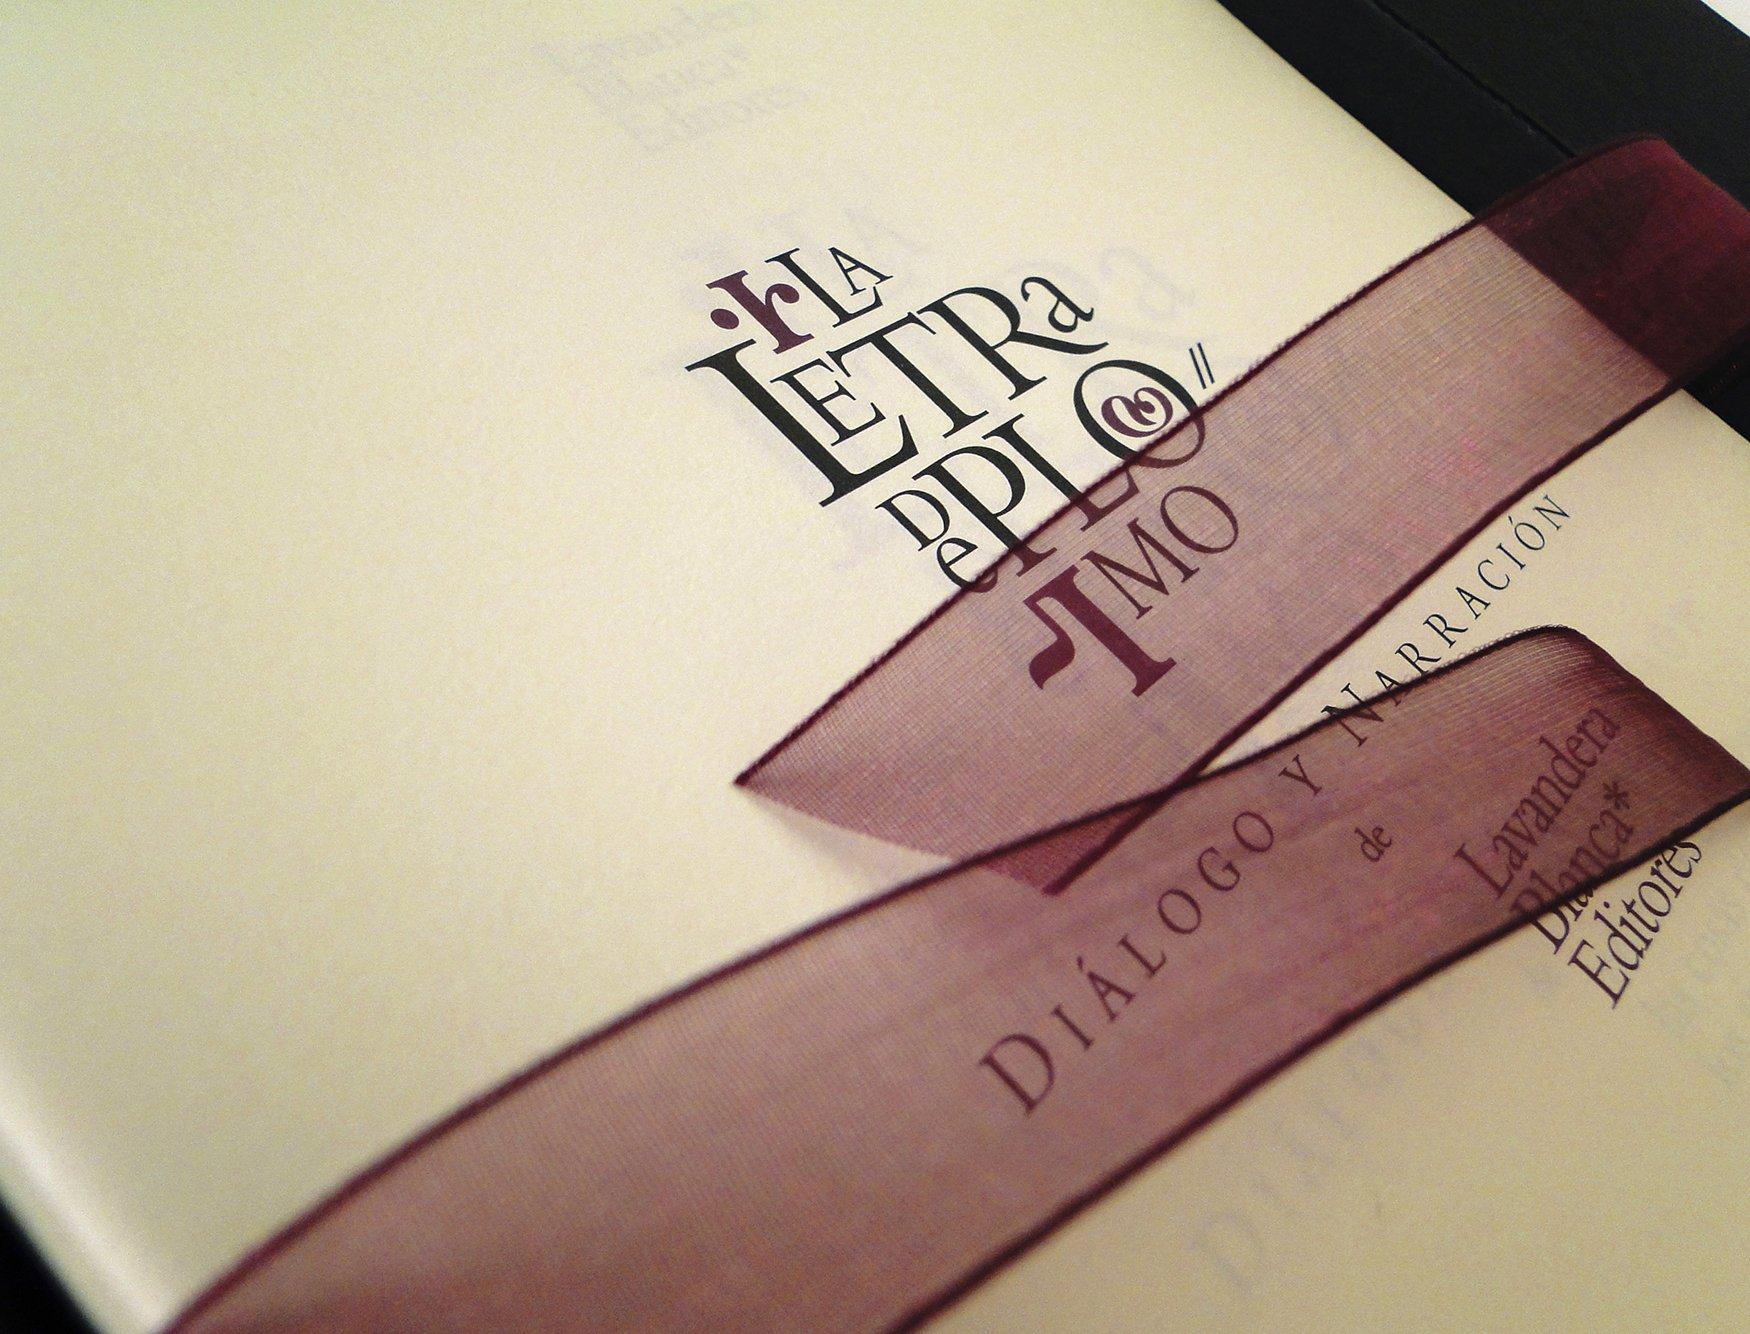 Libro para regalar. Libro de regalo. Libro especial para regalar